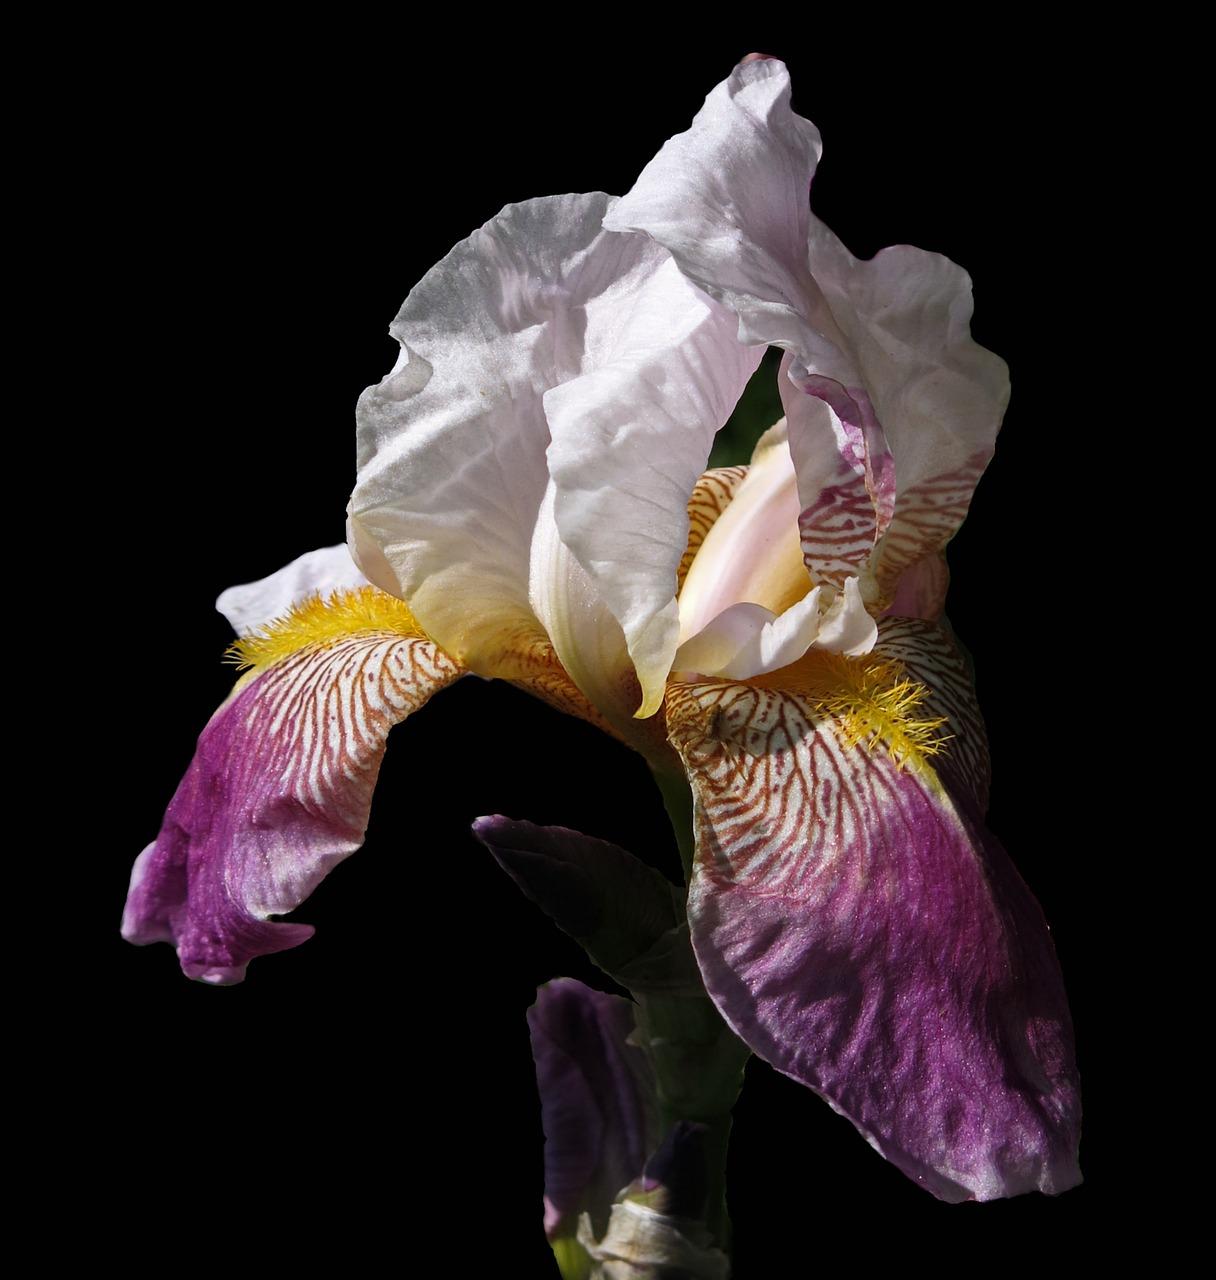 Irisplantbearded irishigh beard irisflower free photo from irisplantbearded irishigh beard irisflowerblossombloom izmirmasajfo